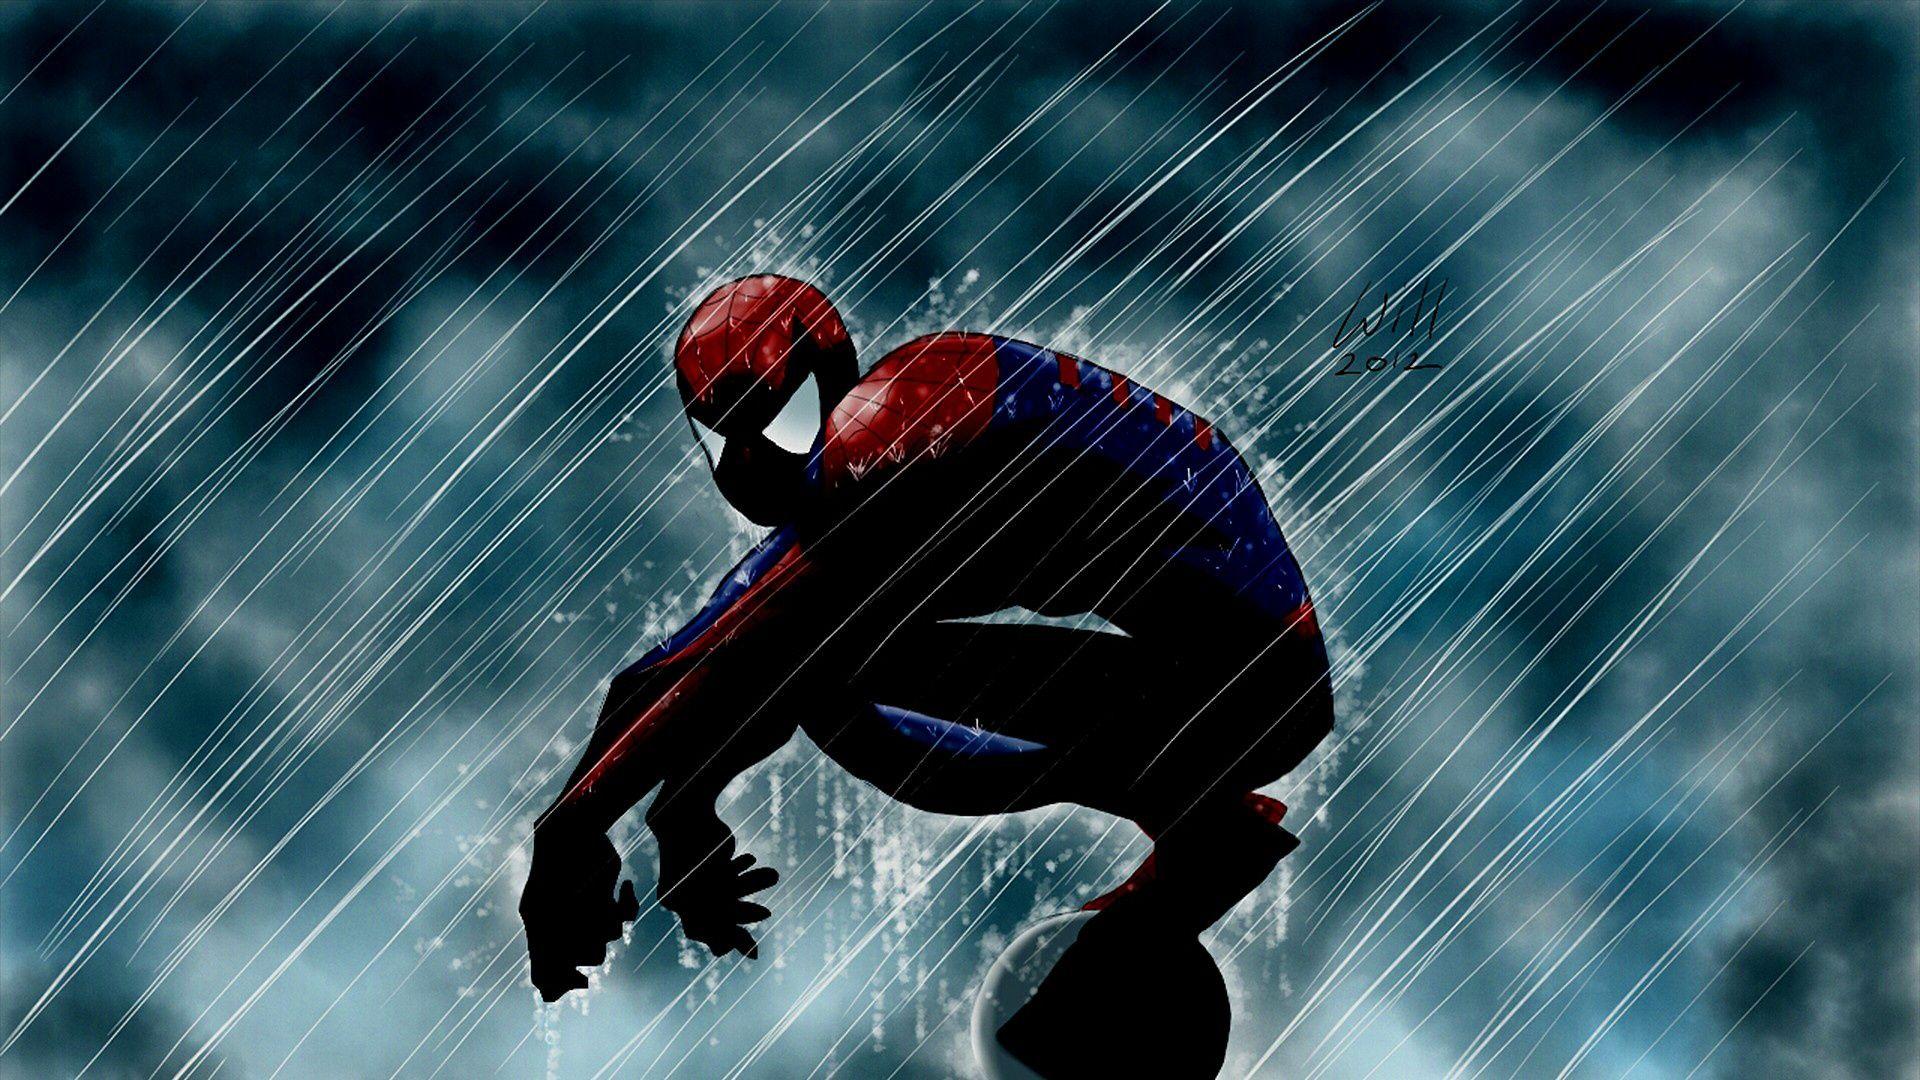 Spider Man Wallpaper